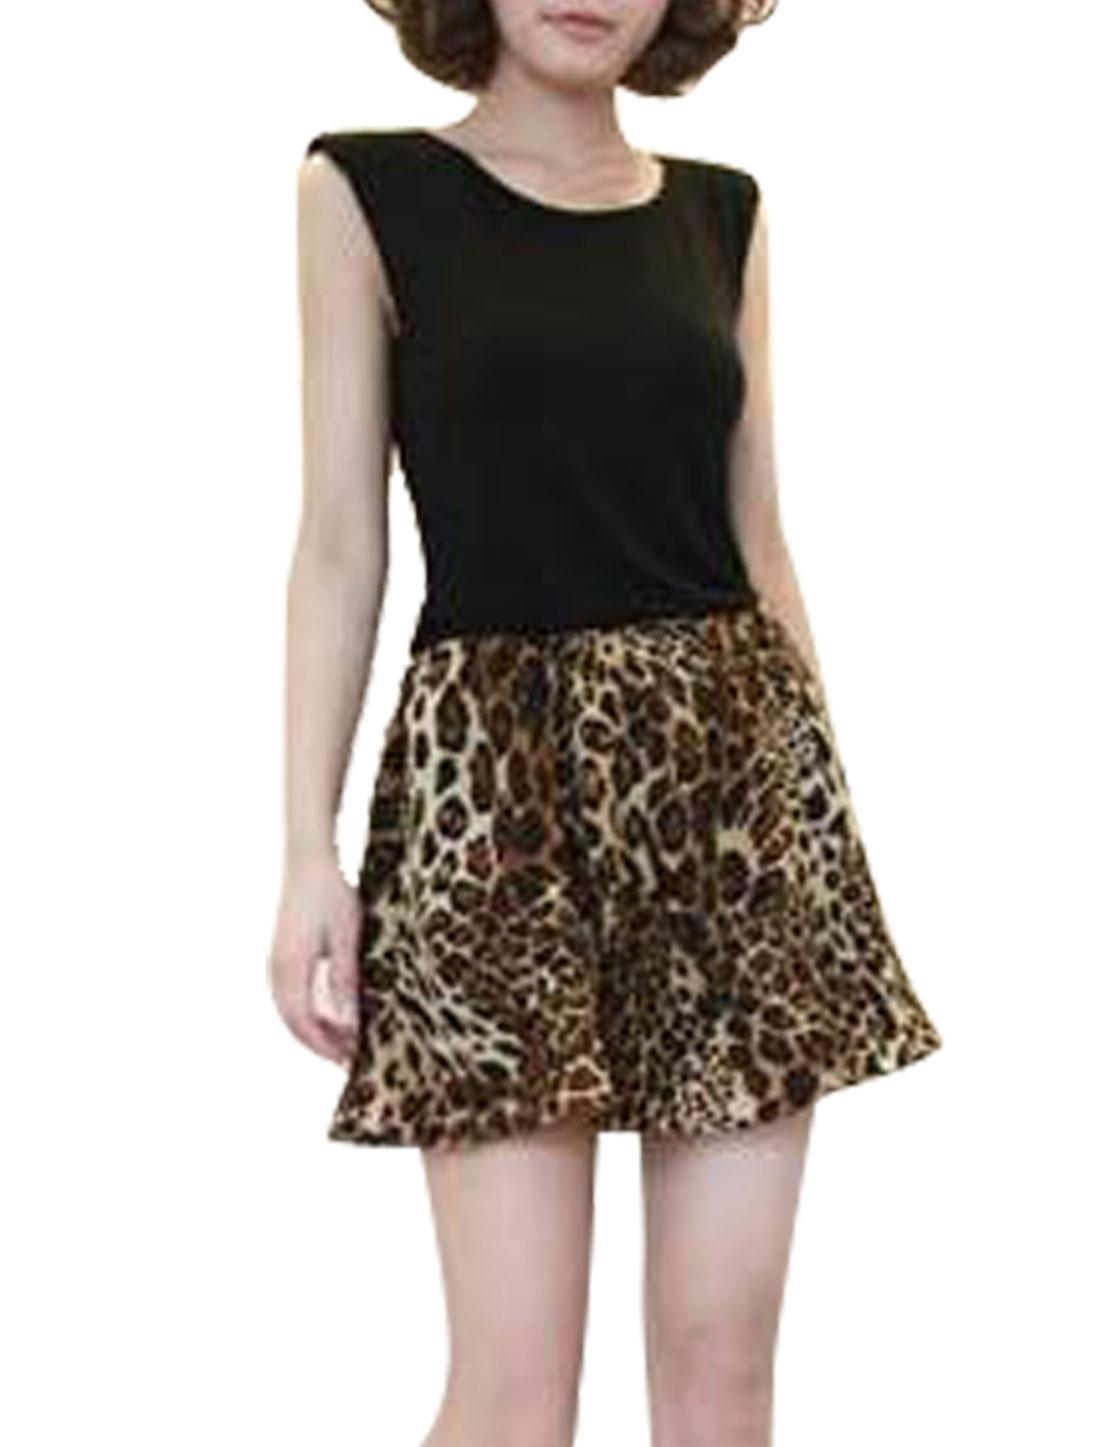 Ladies Scoop Neck Padded Shoulder Sleeveless Leopard Print Mini Dress XS